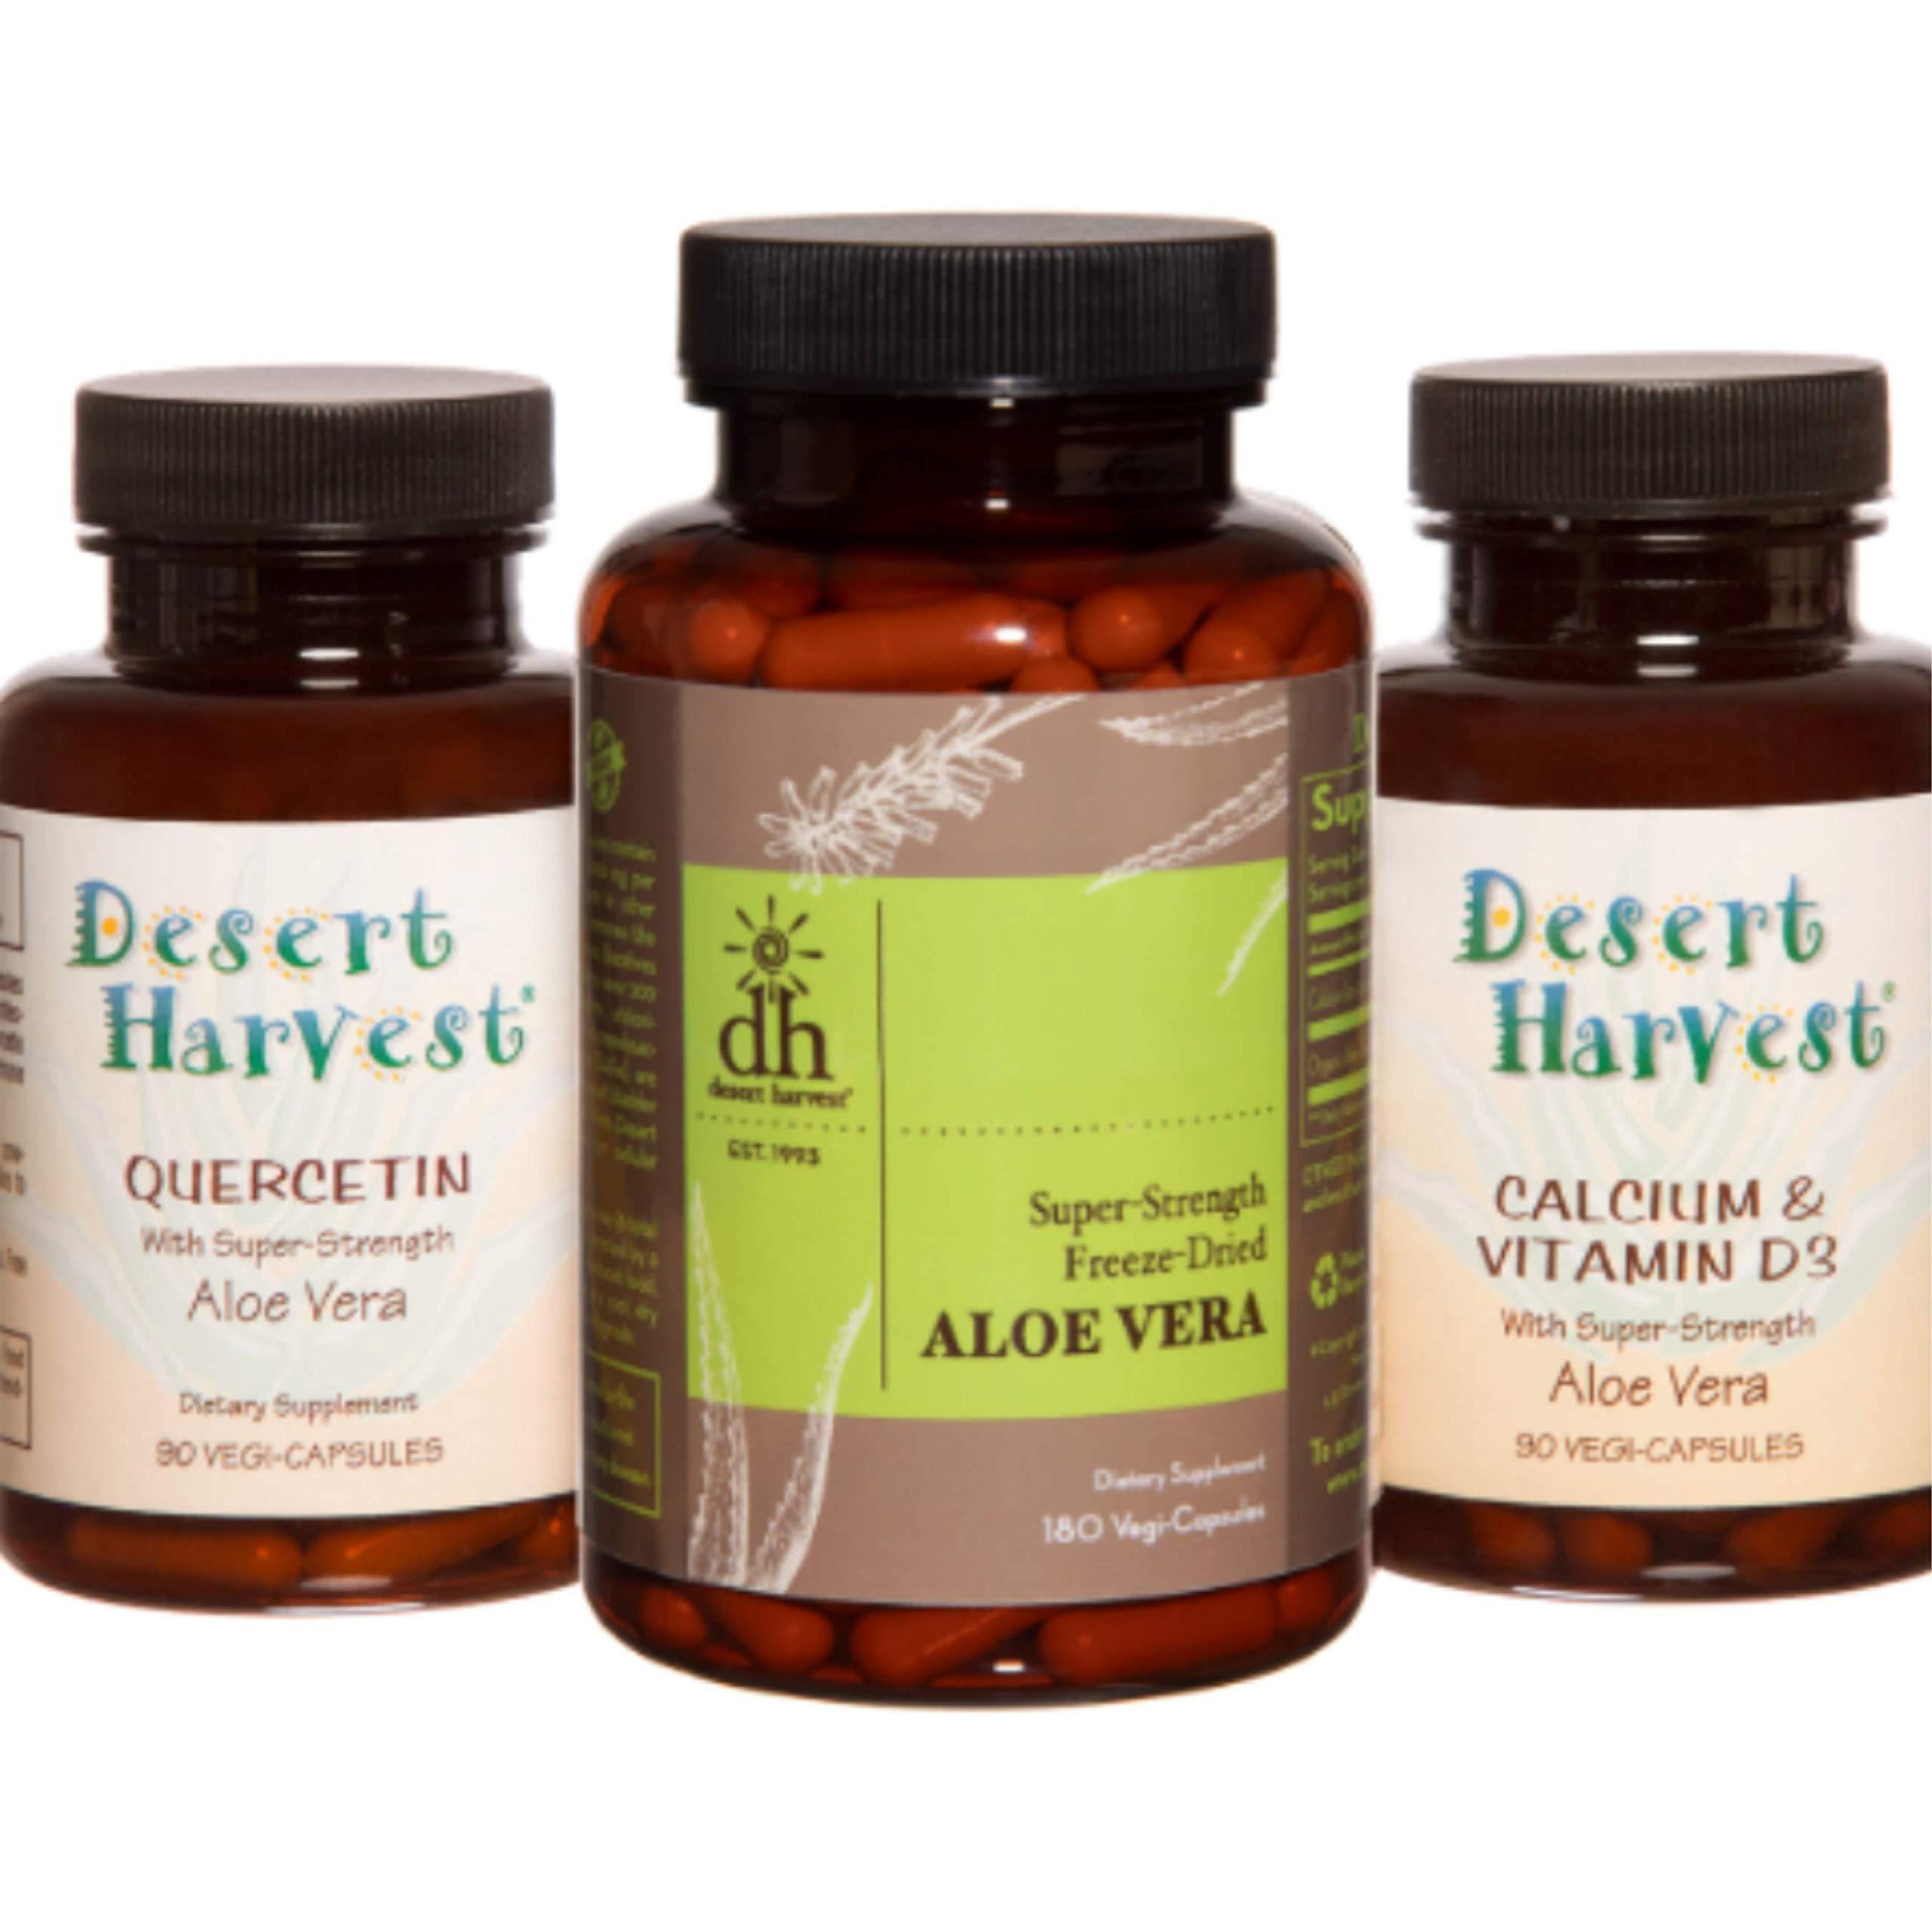 Interstitial Cystitis Starter Kit-Ideal Starter Supplements for IC/PBS. Super-Strength Aloe Vera Capsules + Calcium/Vitamin D3 + Quercetin. Bladder Pain Relief, antihistamine & Acid Reducer by Desert Harvest